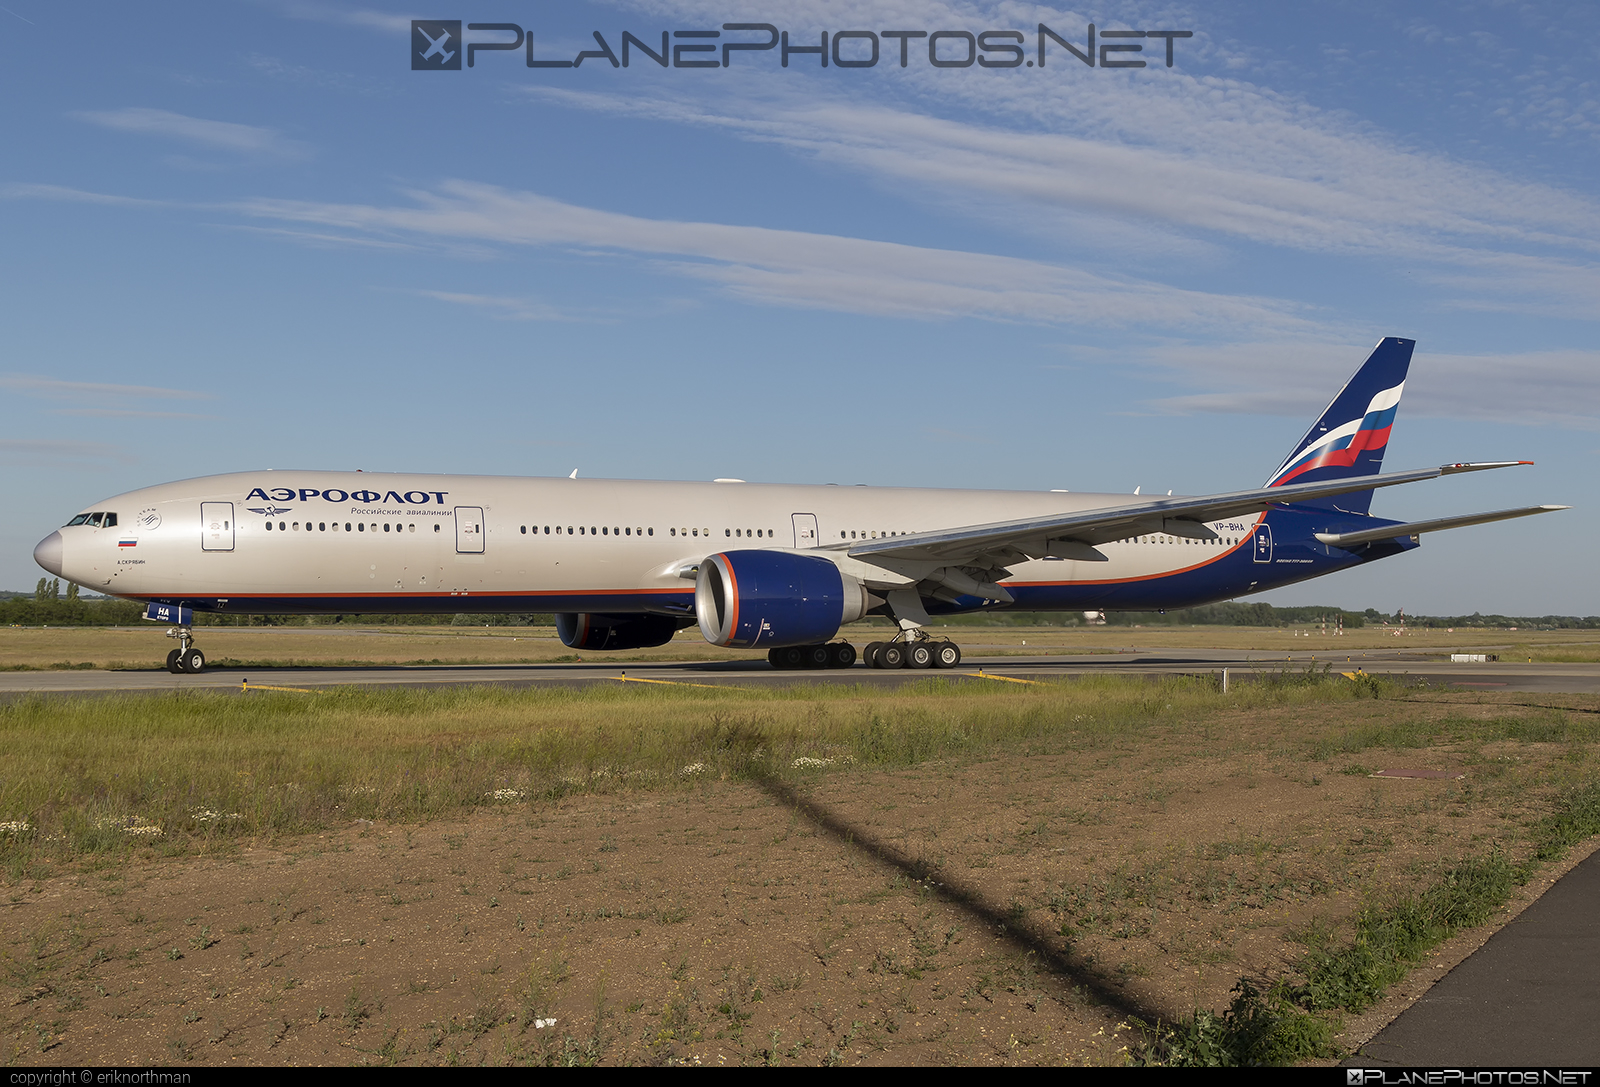 Boeing 777-300ER - VP-BHA operated by Aeroflot #aeroflot #b777 #b777er #boeing #boeing777 #tripleseven